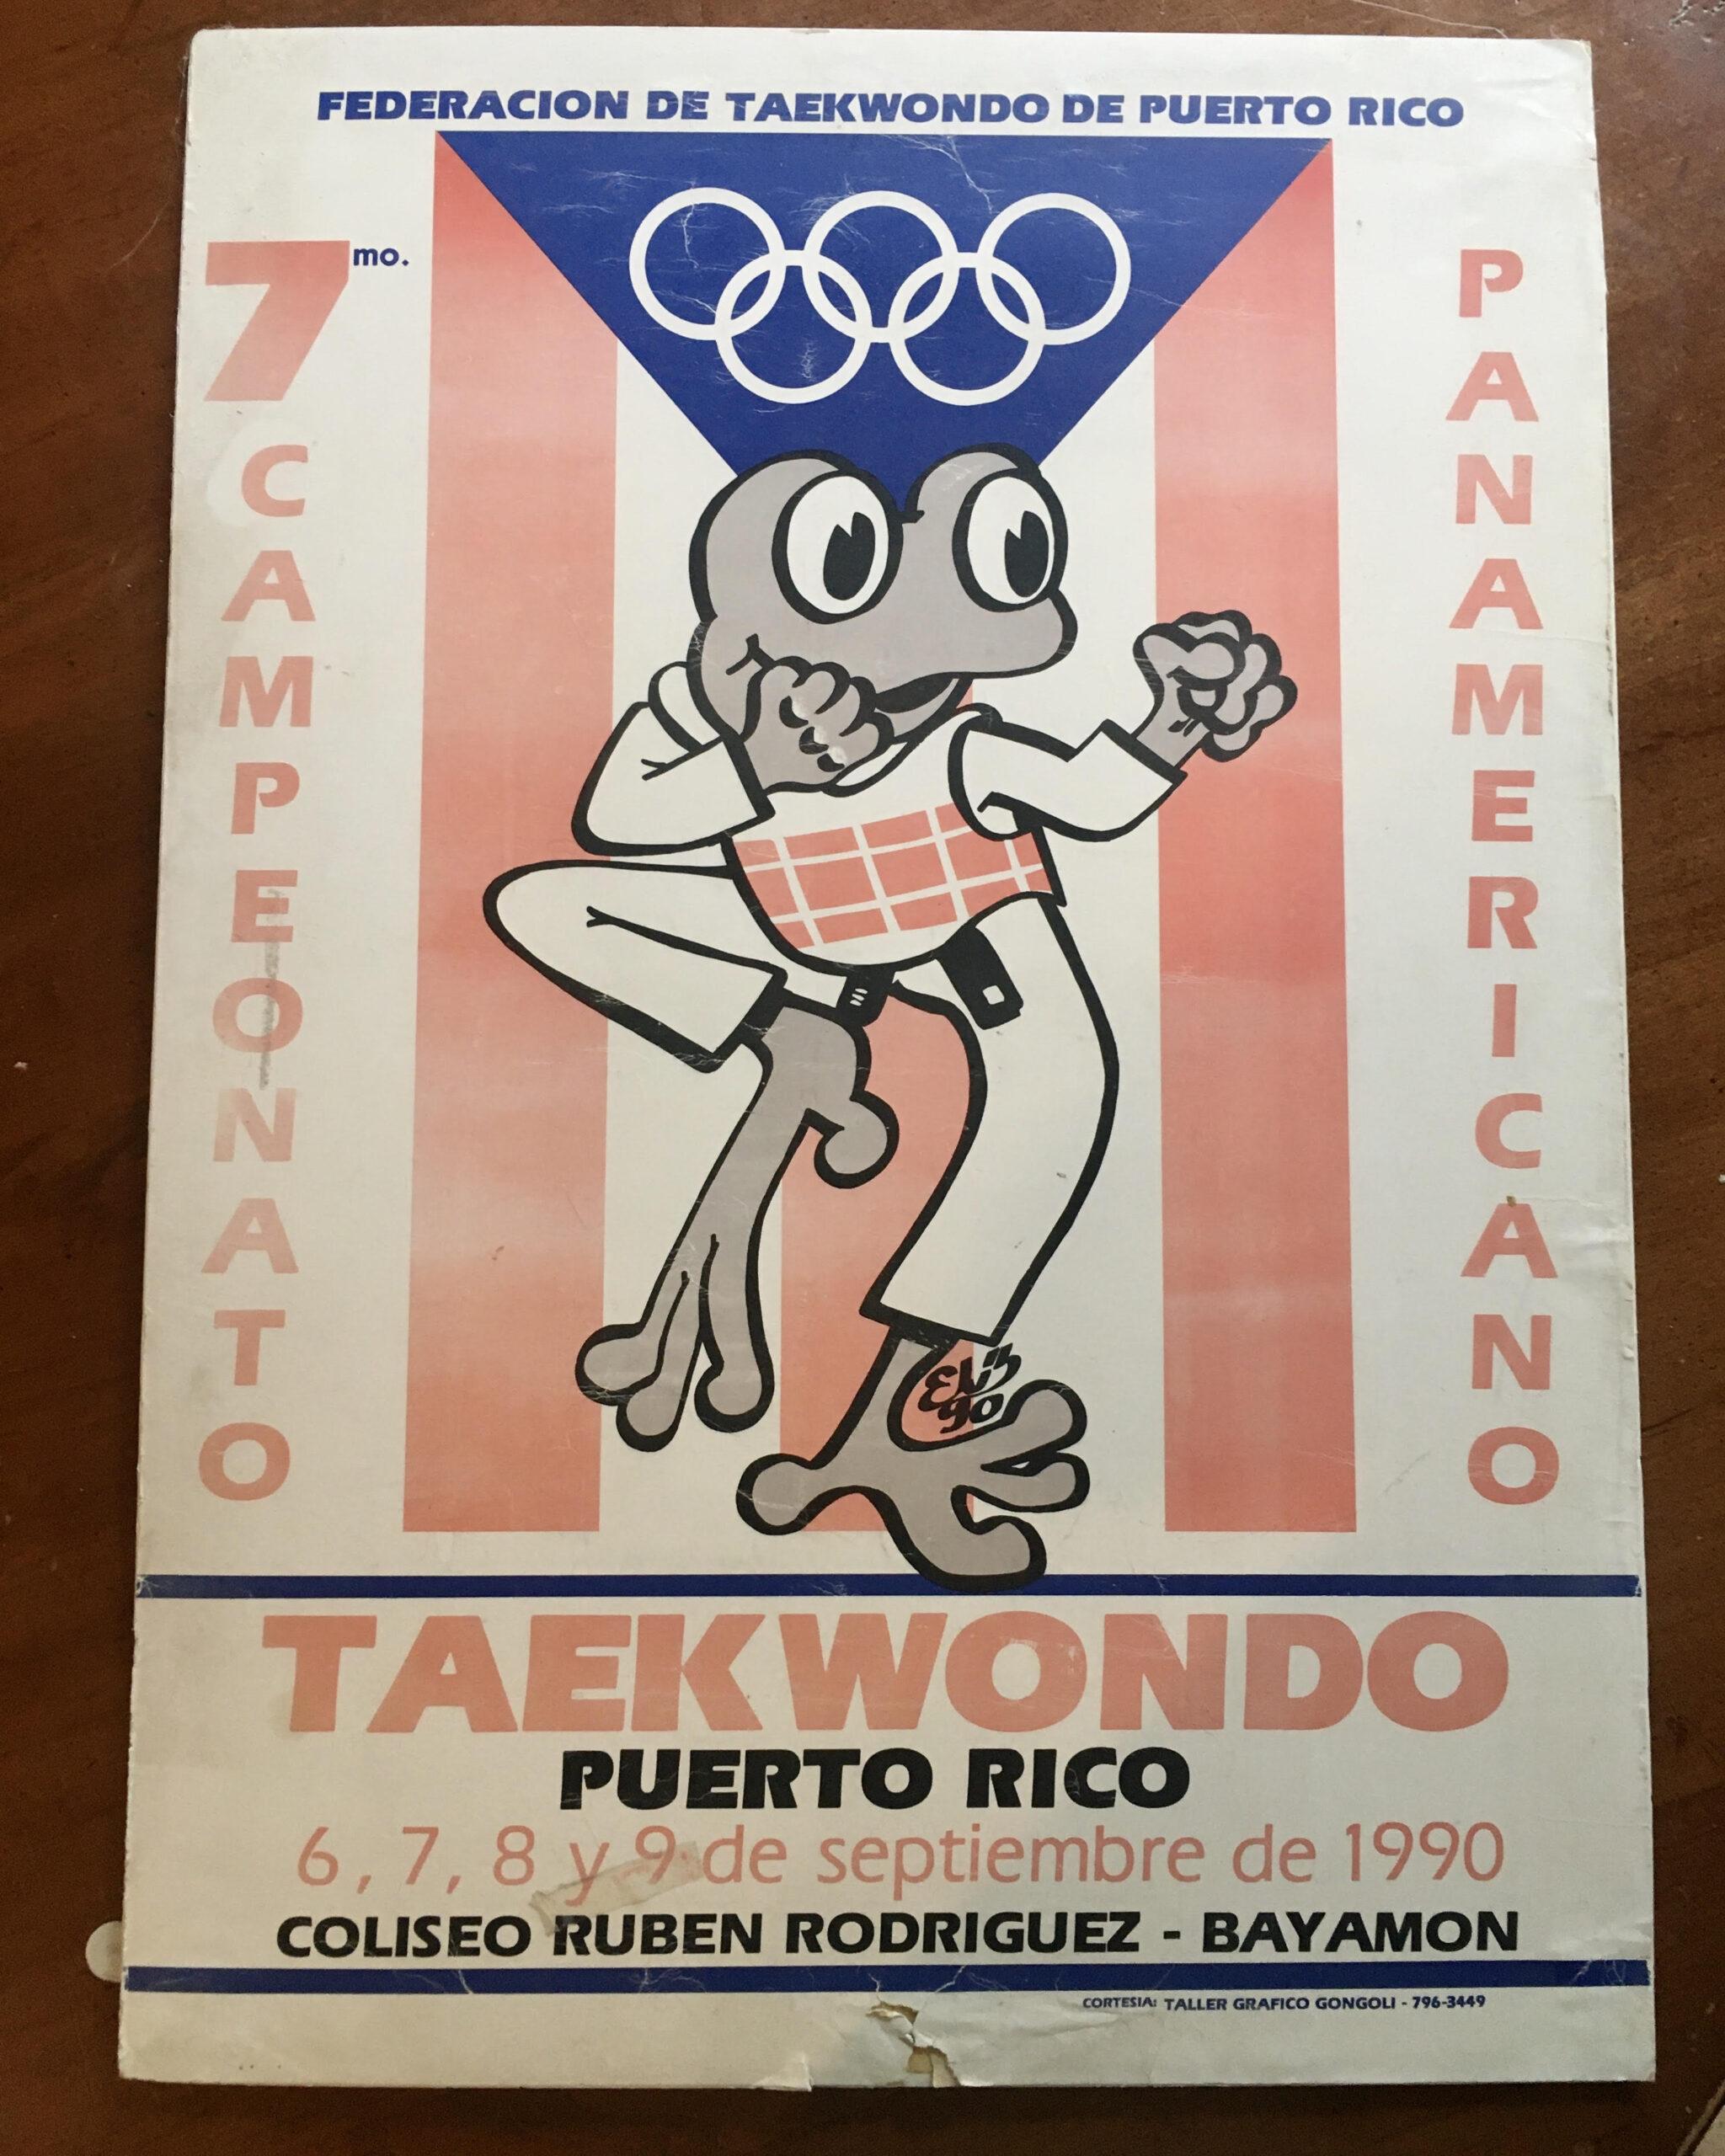 Poster of 1990 Taekwondo Championship in Puerto Rico